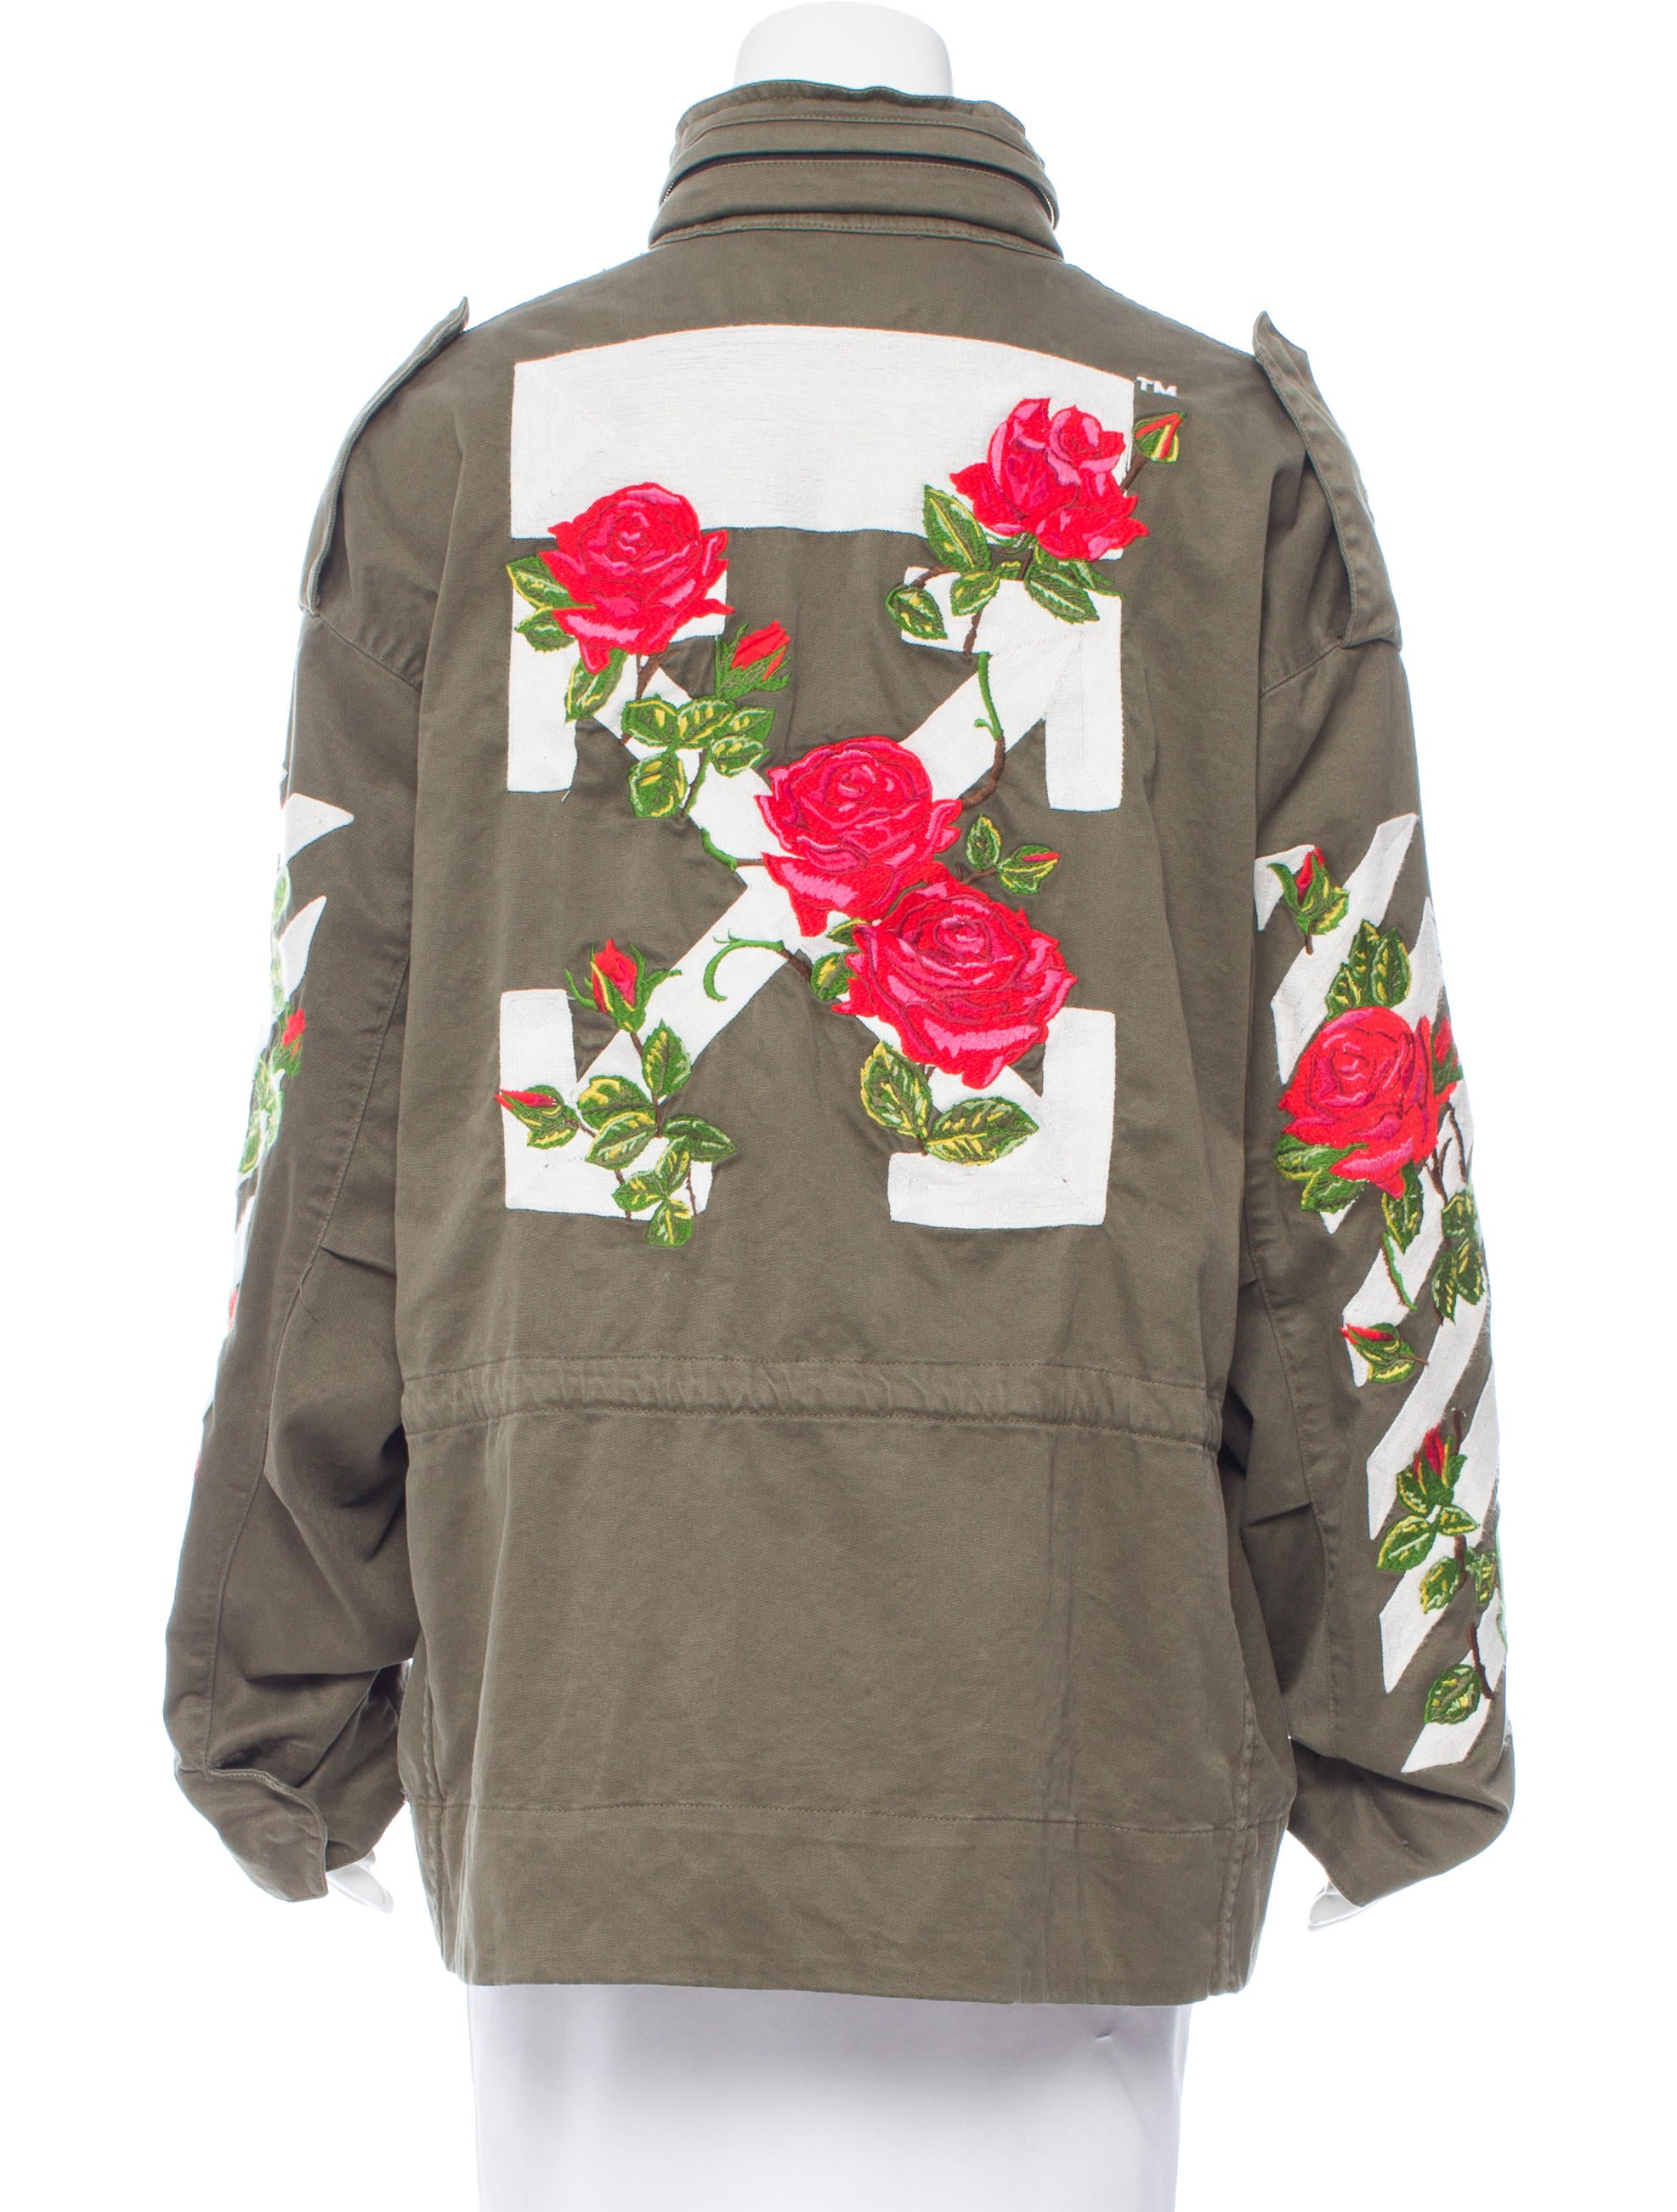 OffWhite 2017 RoseEmbroidered Cargo Jacket  Clothing